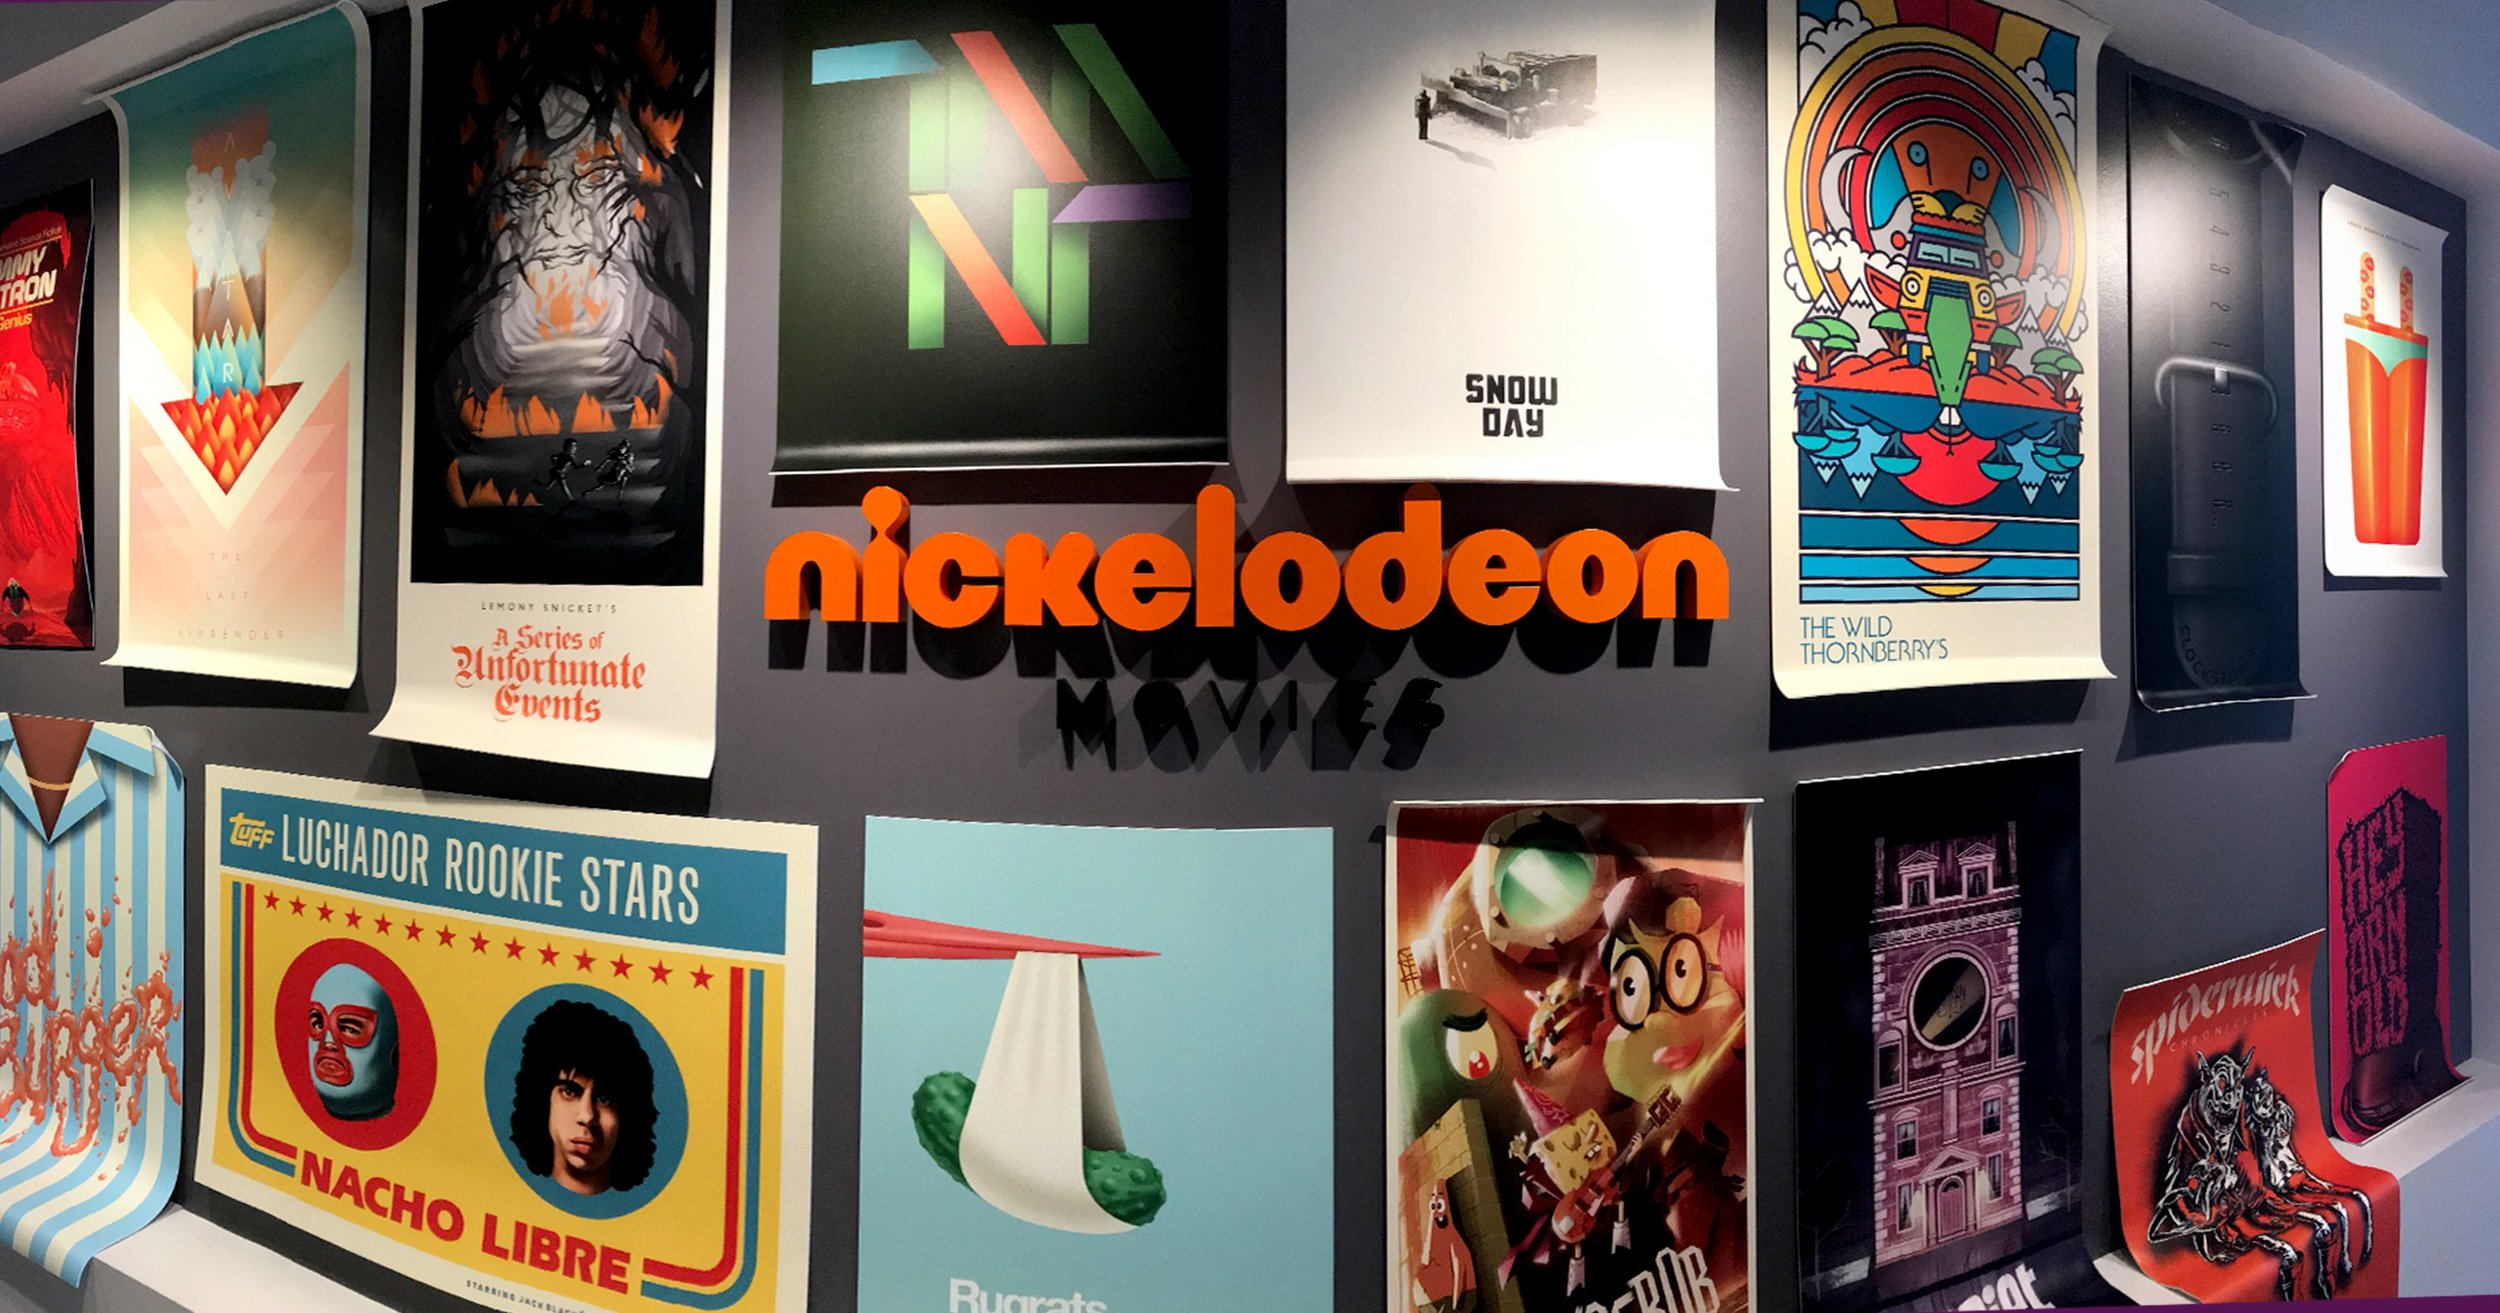 Nickelodeon Movies Poster Wall